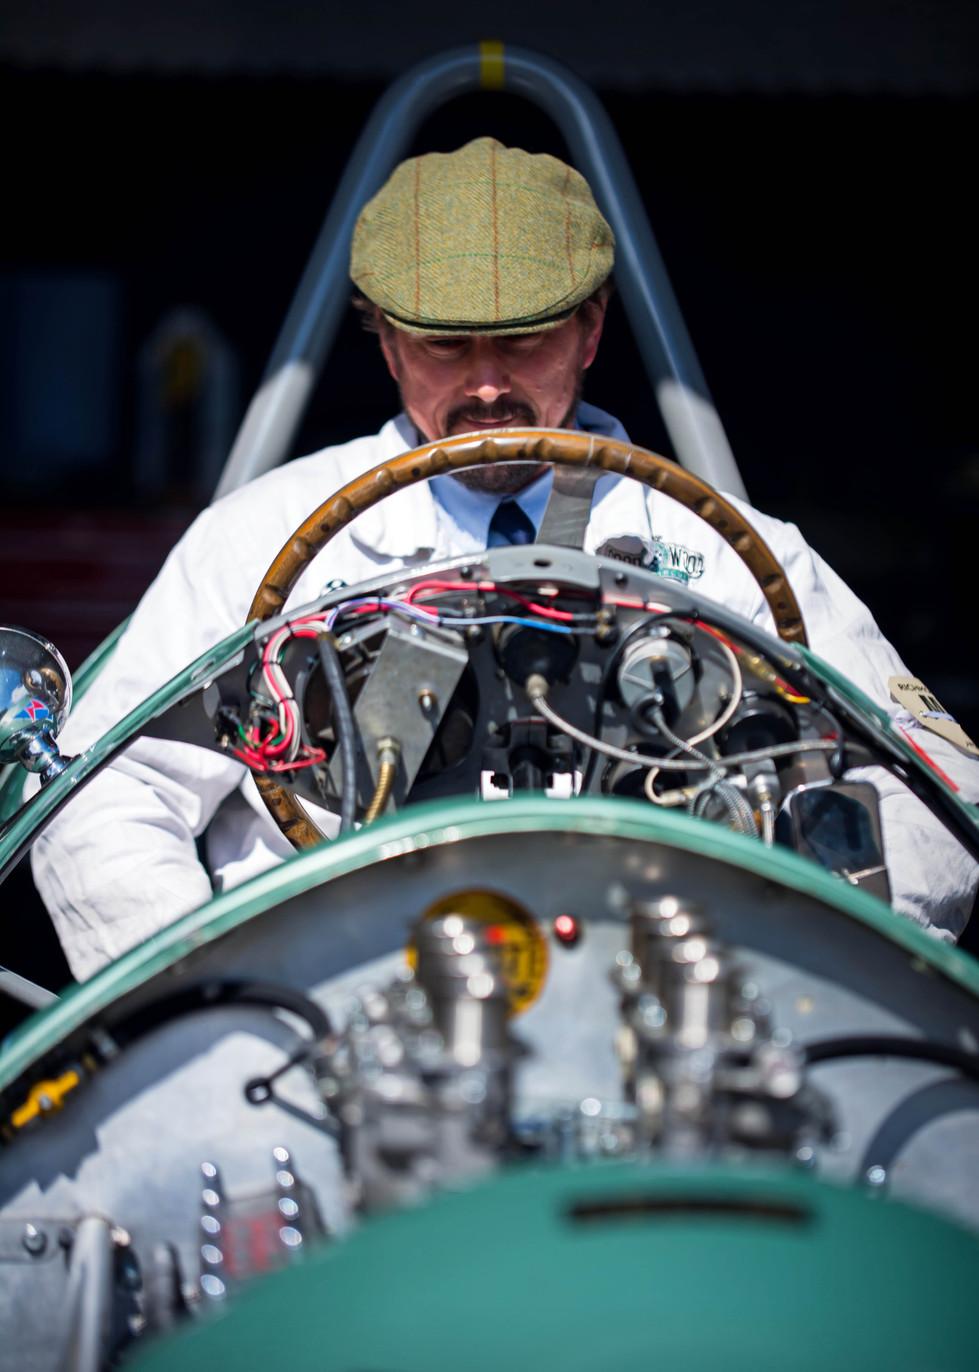 Nigel Batchelor's 1954 Kieft Climax GP